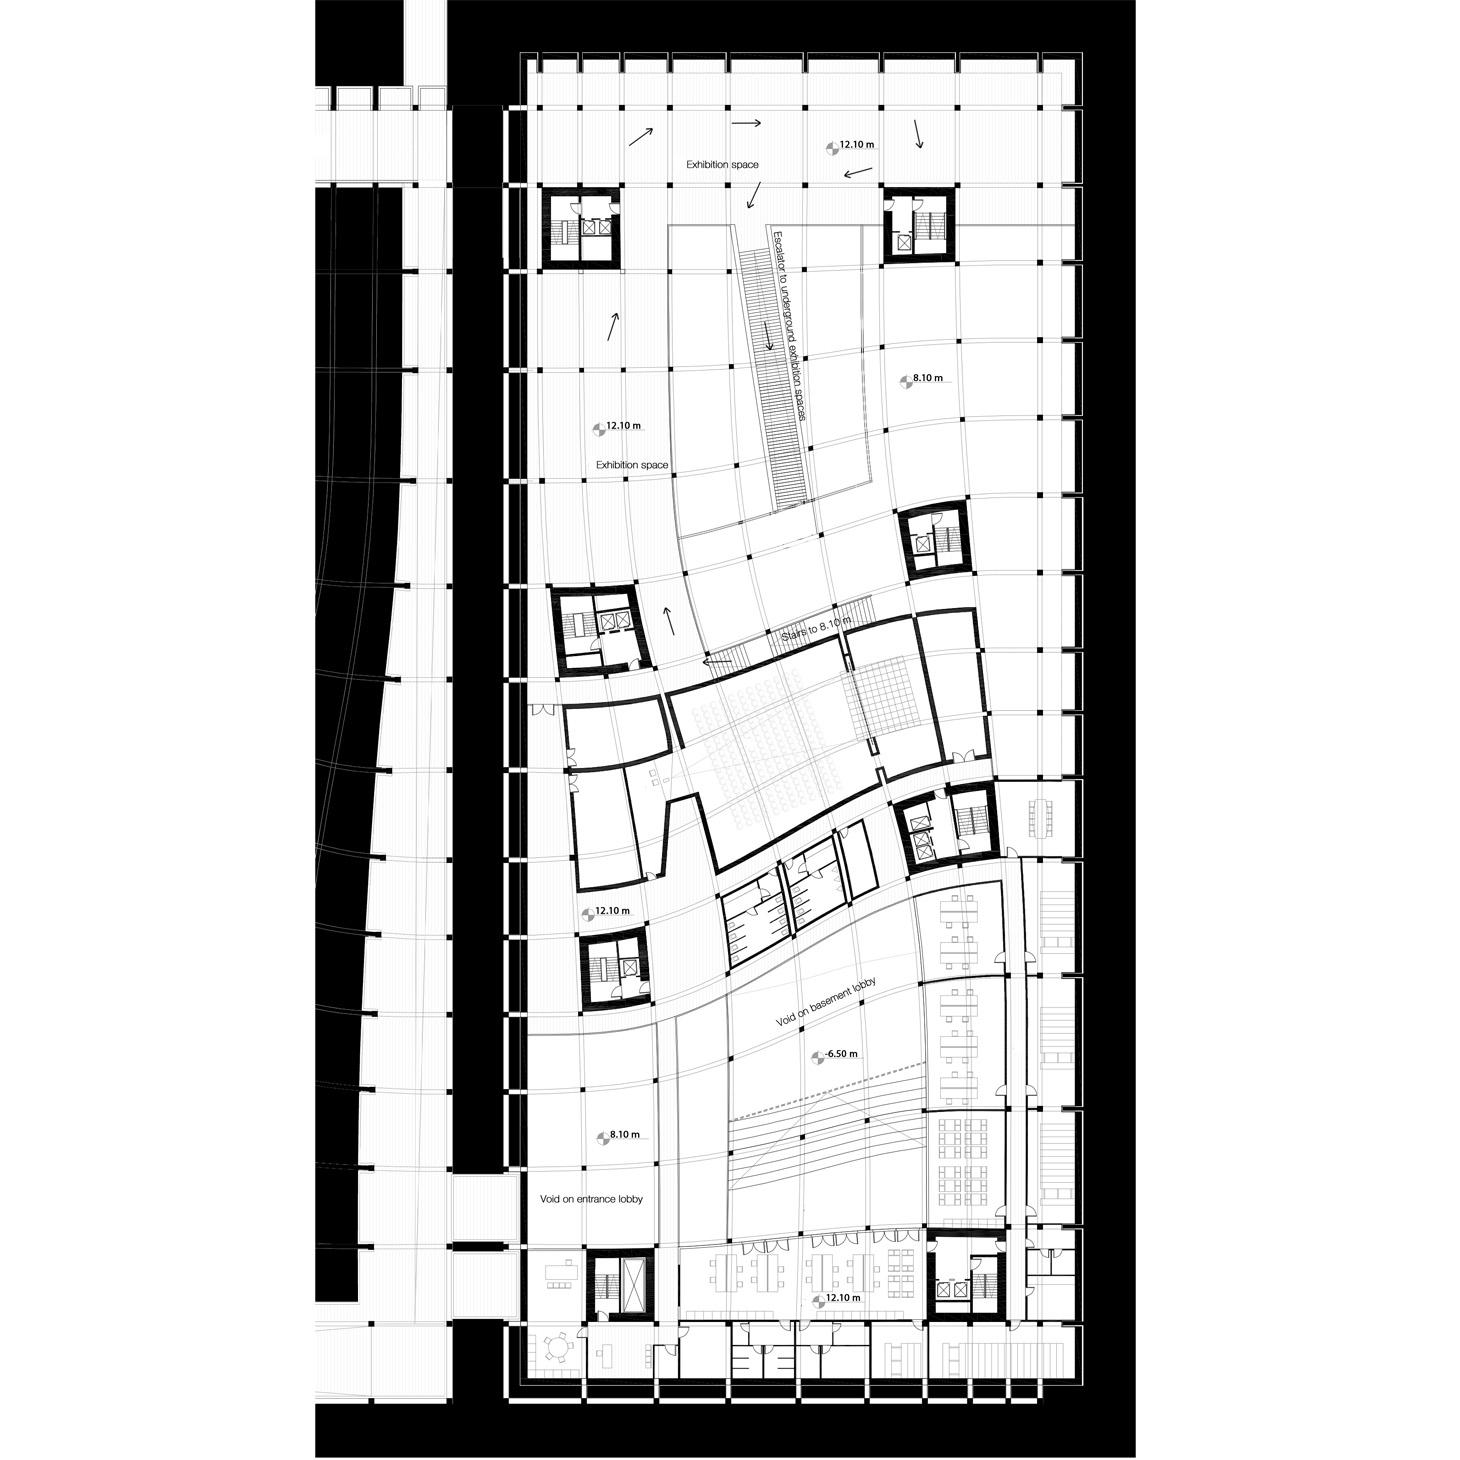 Degli-Esposti-Architetti_Helsinki-Guggenheim-Museum_09a